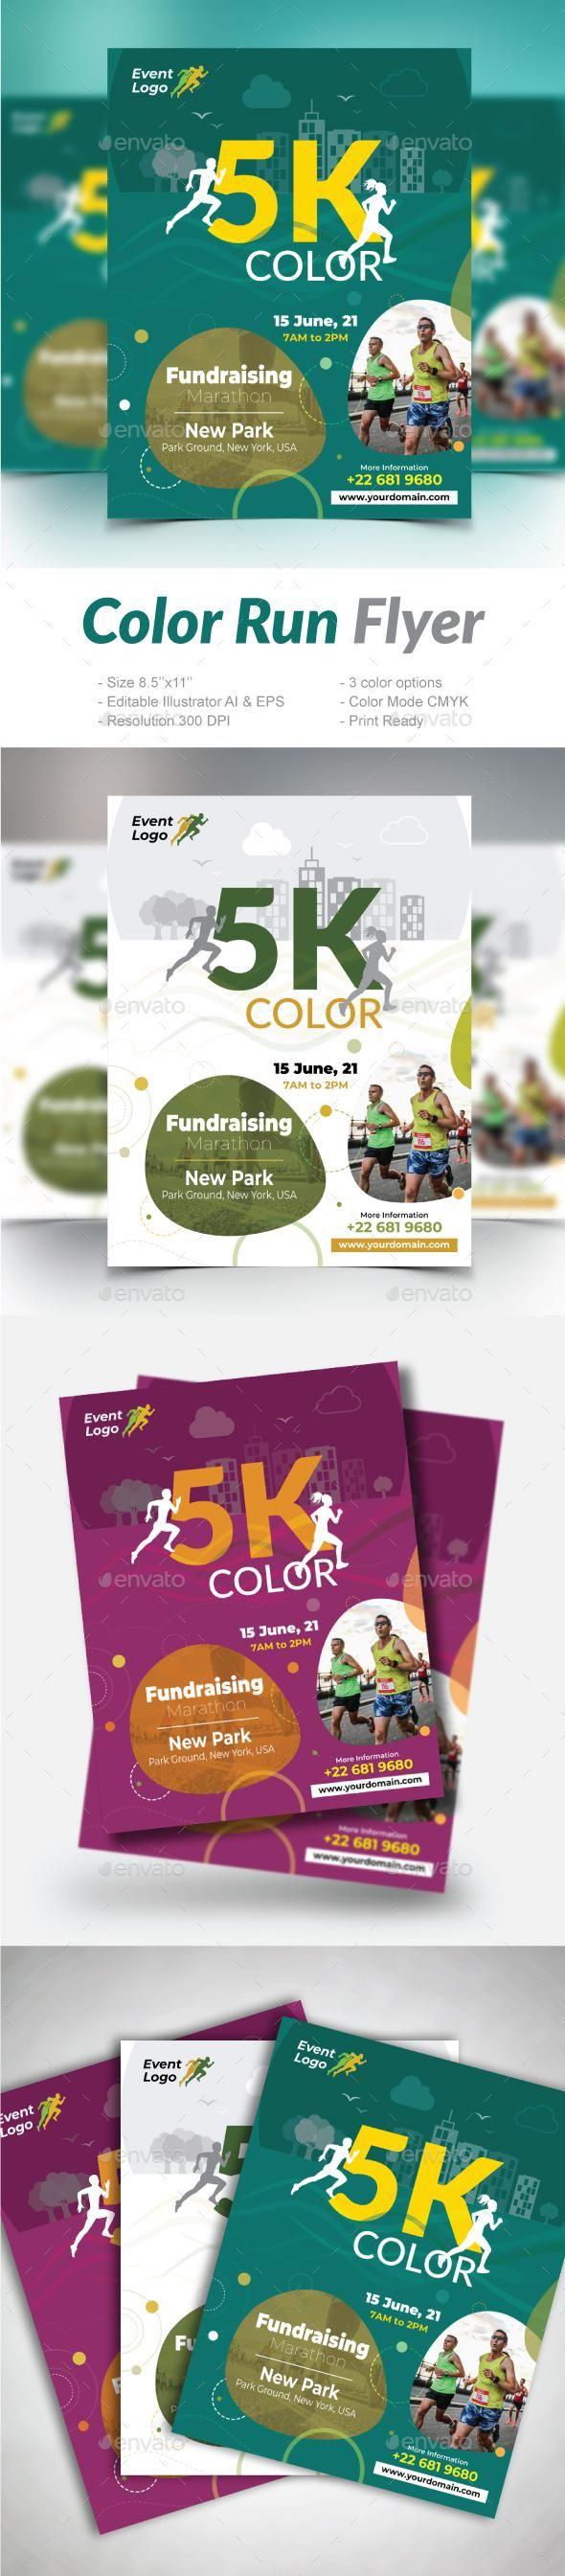 color run flyer envato market flyer flyertemplate printdesign